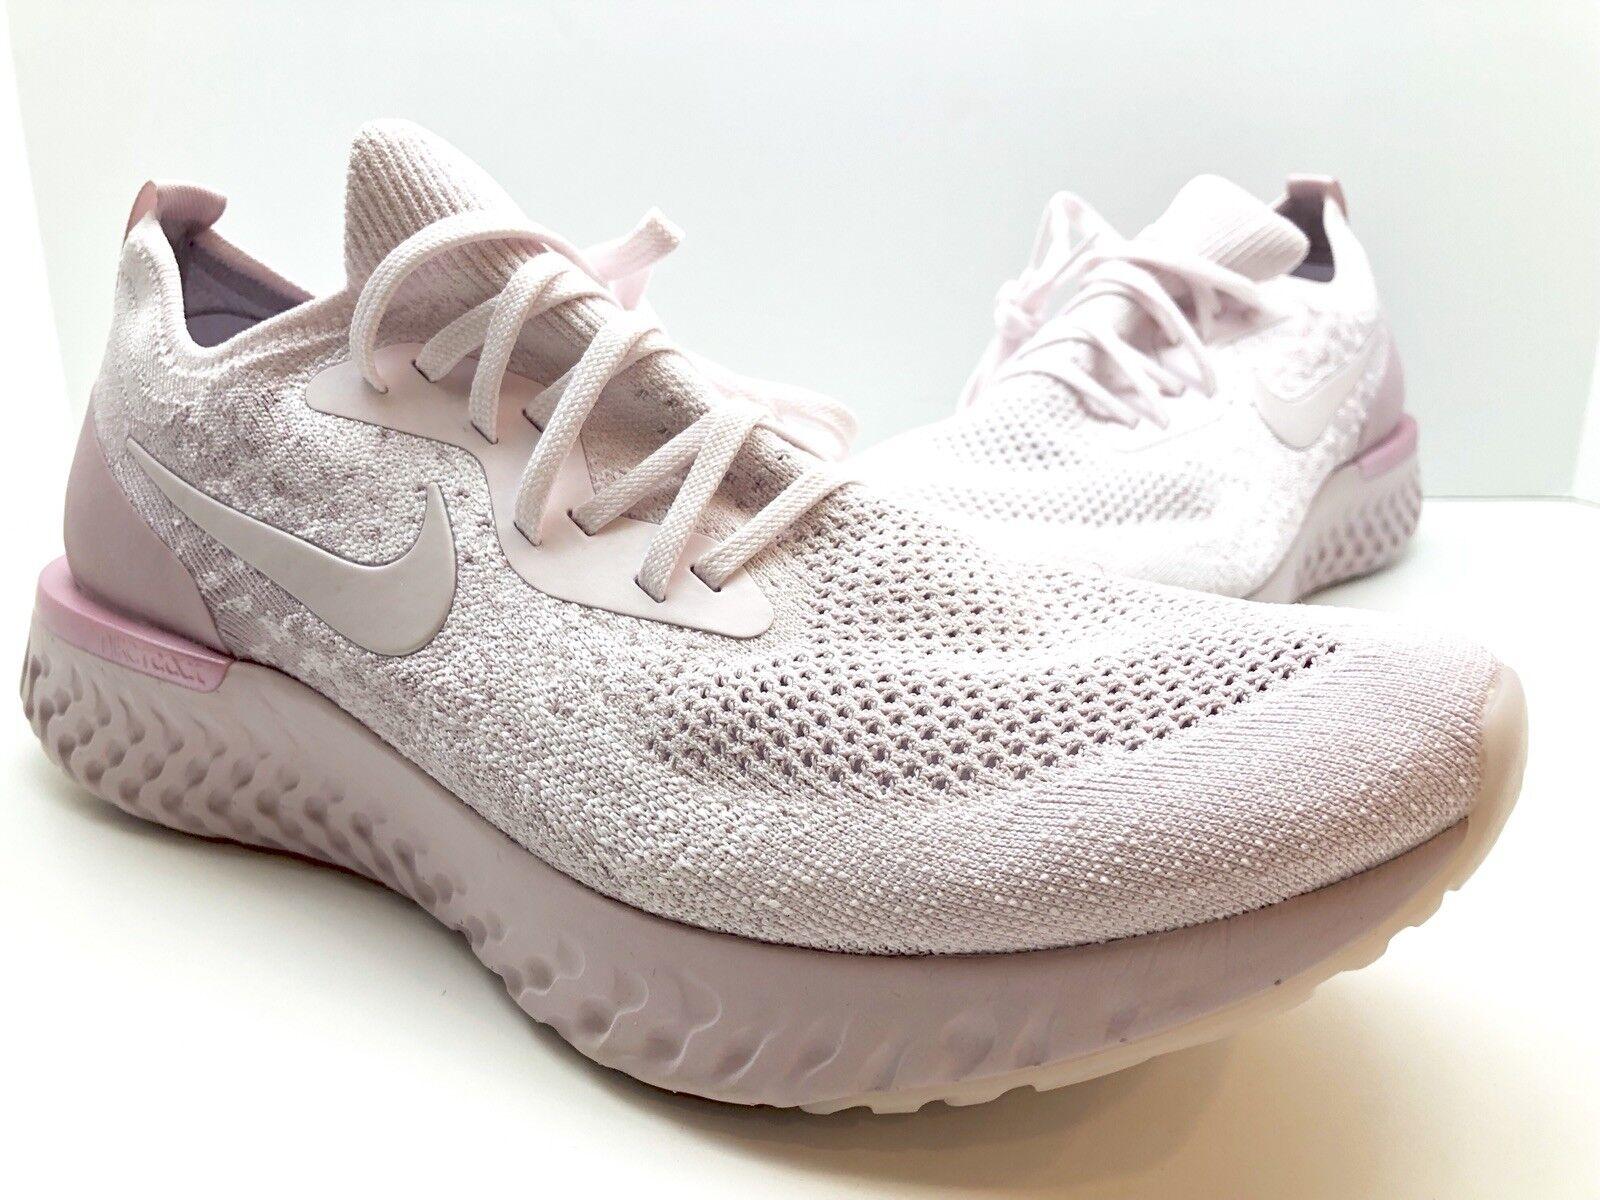 e9285f822dd Nike Epic React Flyknit Mens Running Shoes Pearl Pink Aq0067 600 Sz ...